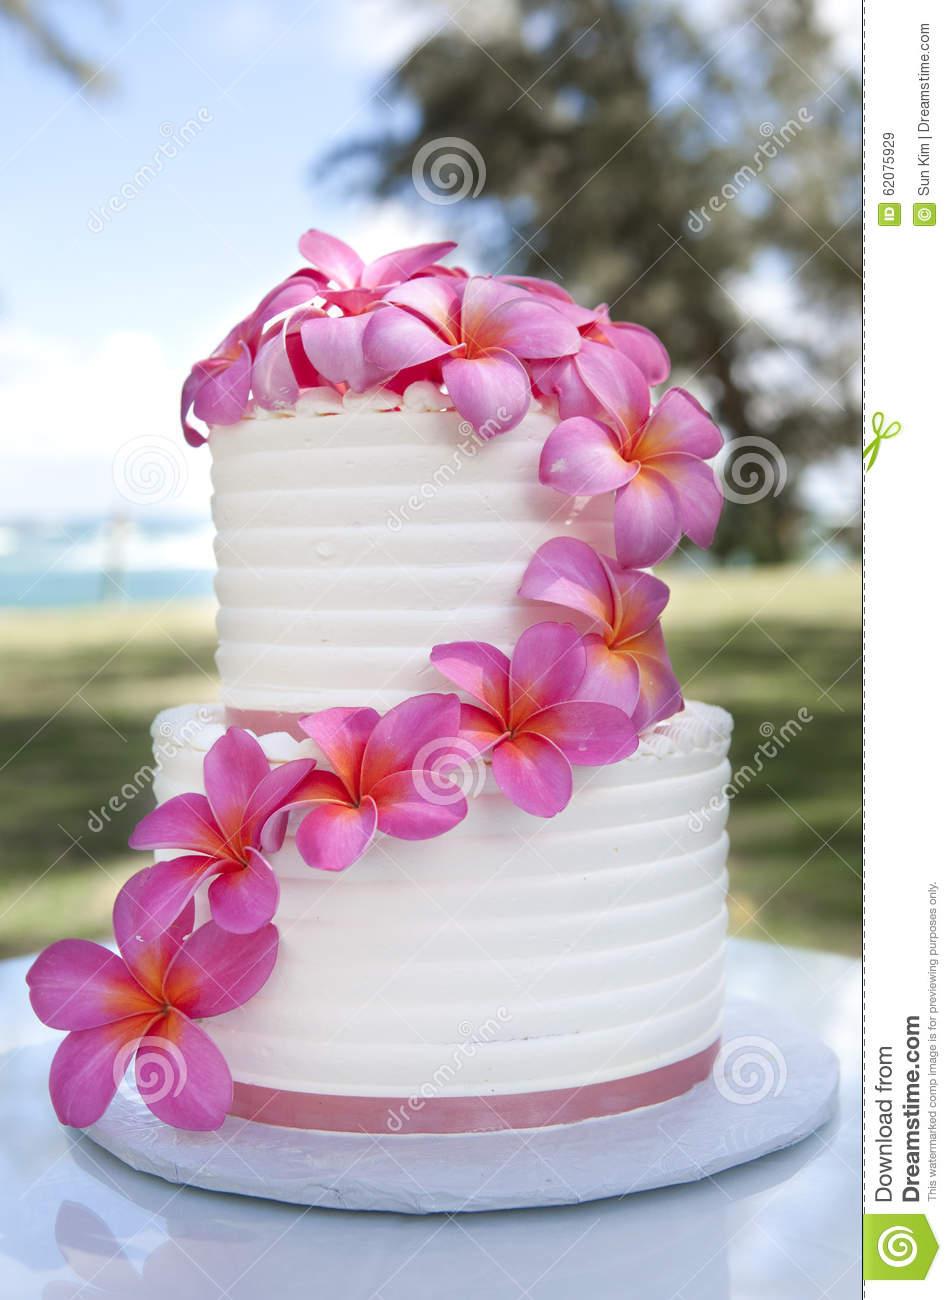 13 Hawaii Flower Cakes Photo - Hawaiian Wedding Cake with Flowers ...